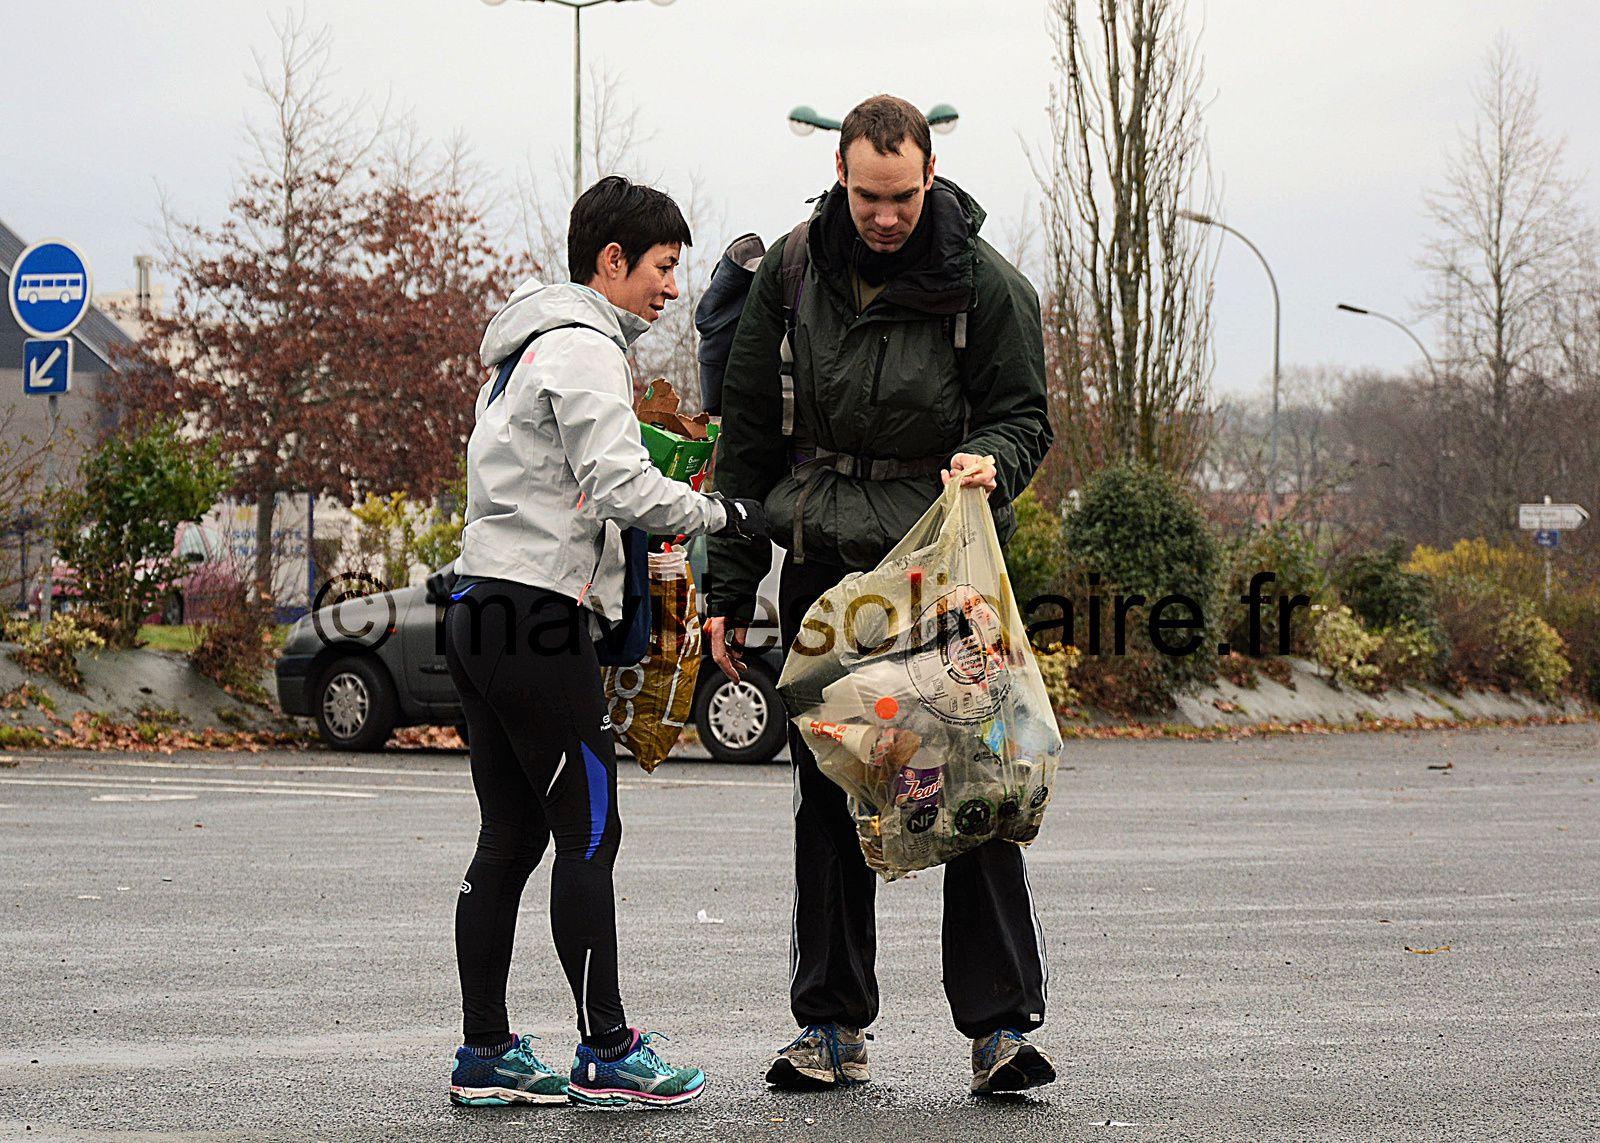 Run Eco a couru pour l'environnement à La Roche-sur-Yon.